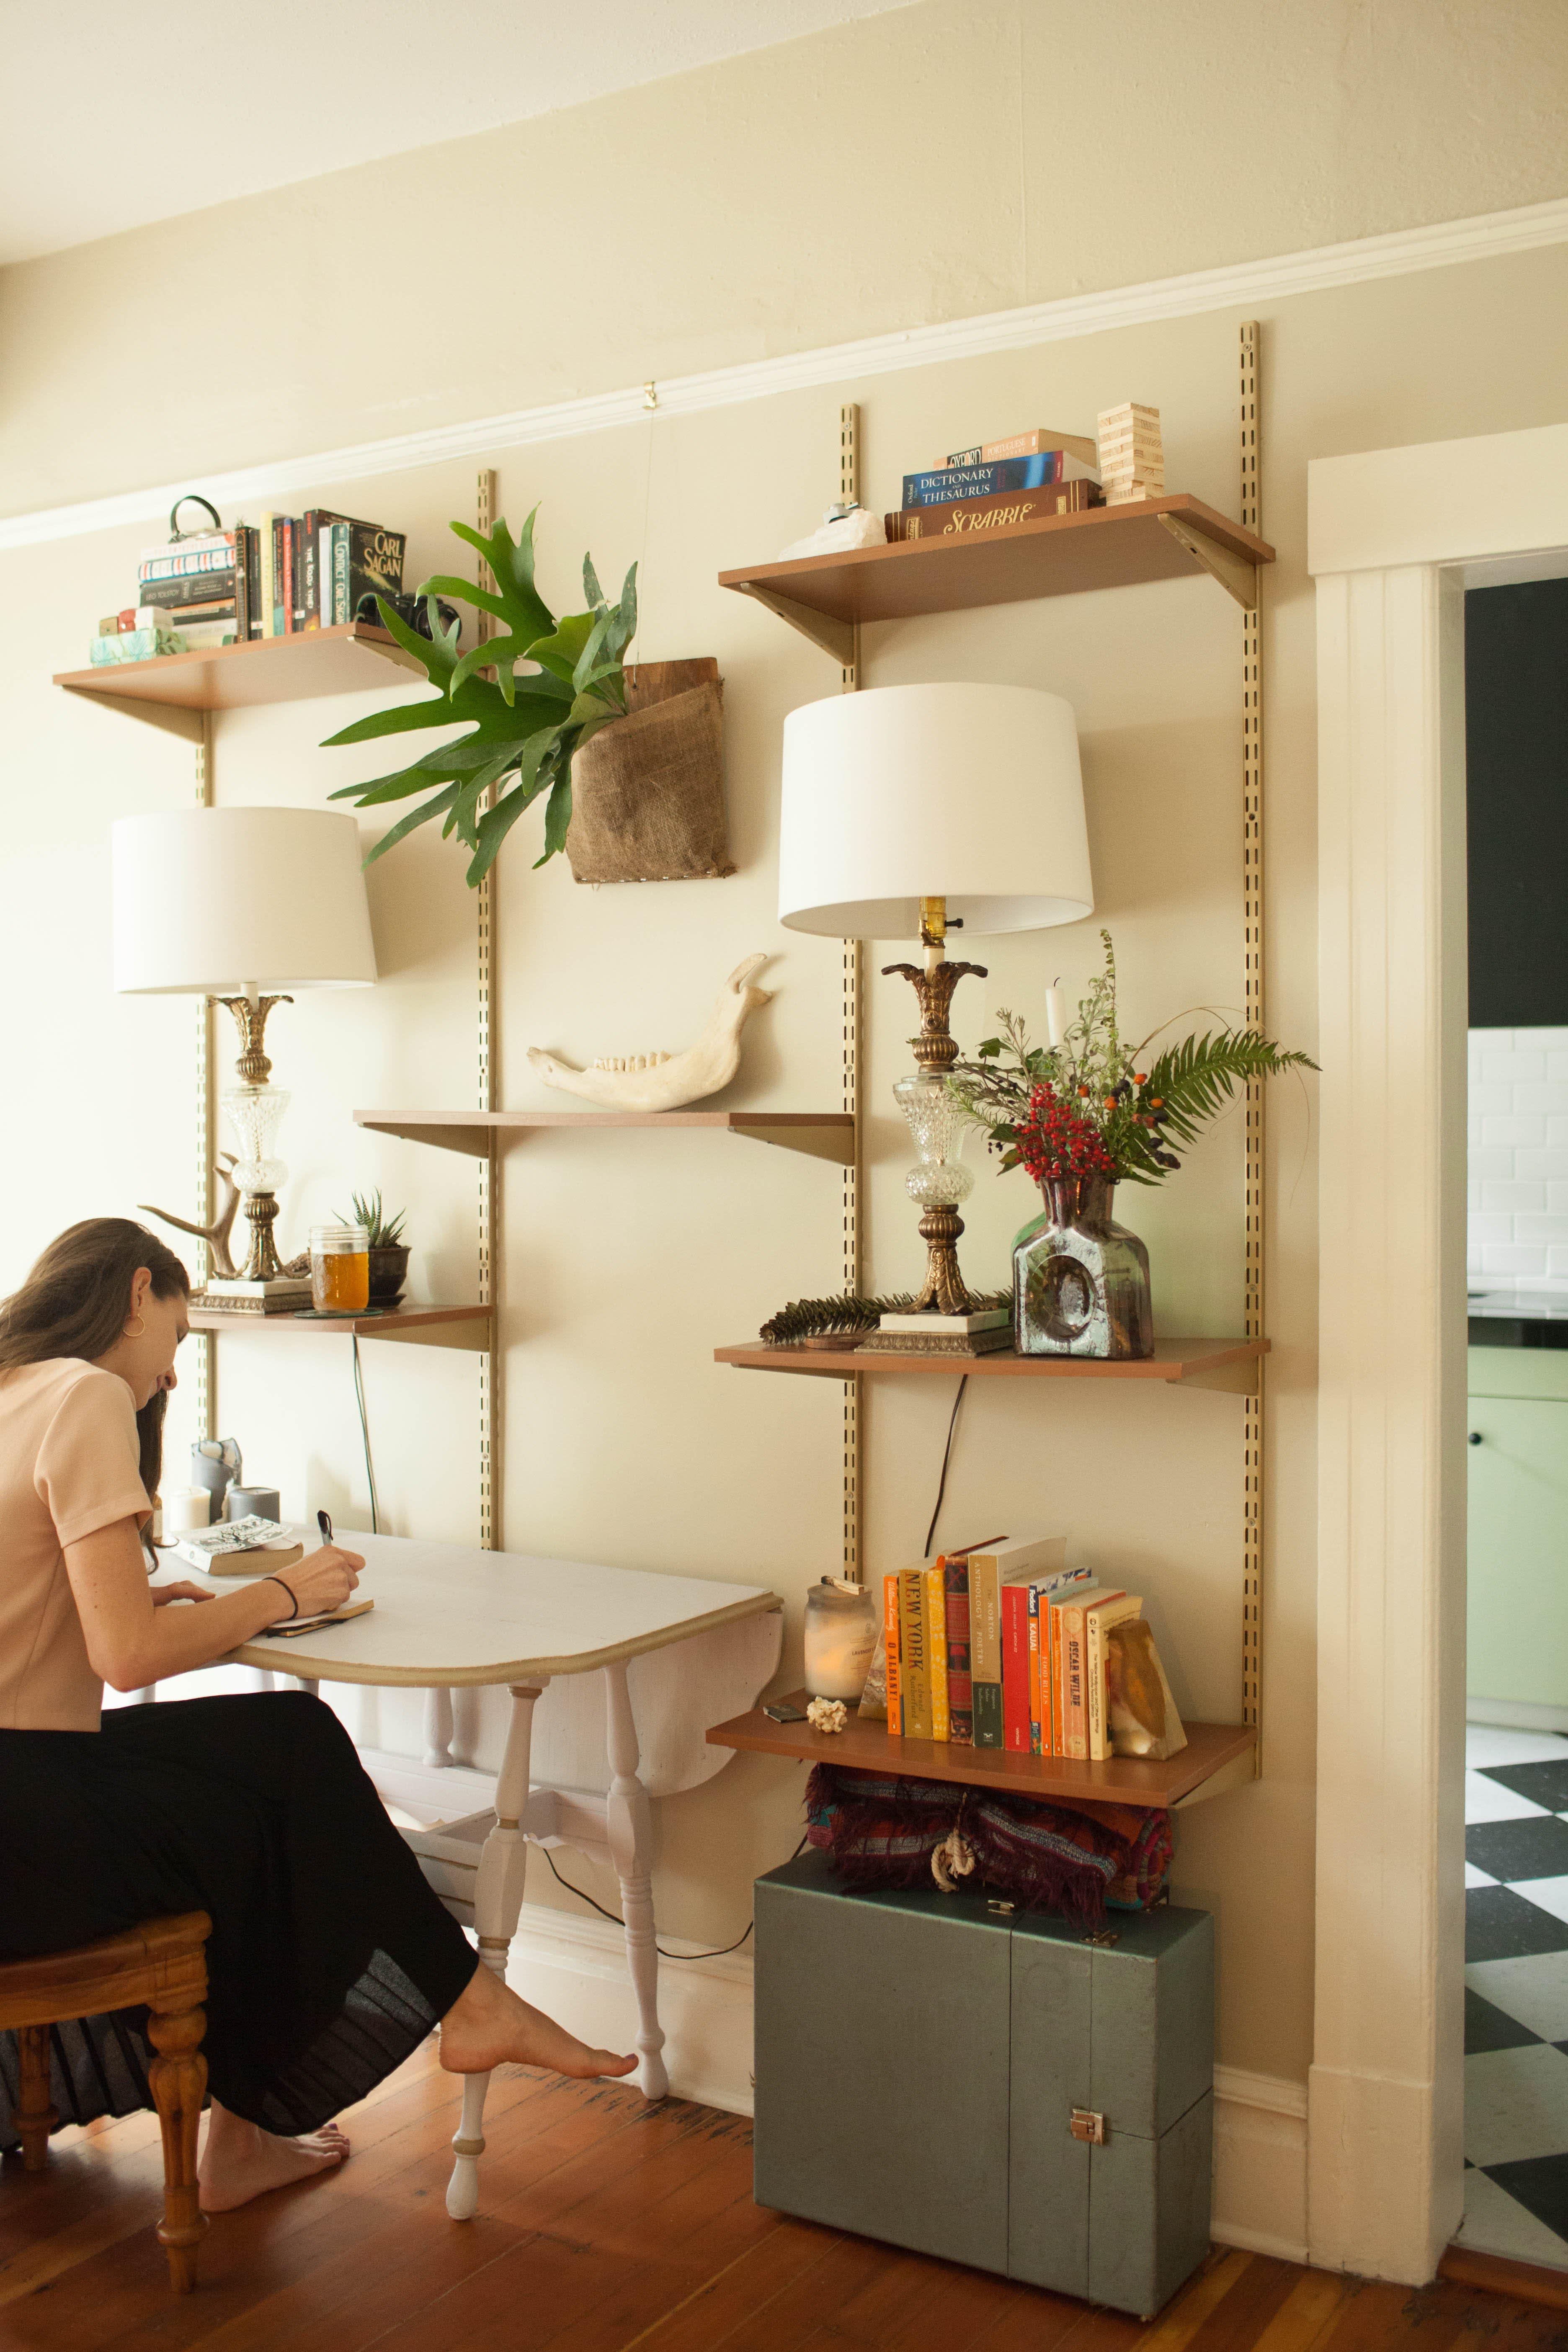 House Tour: A Cozy & Refined Portland Studio Apartment ...